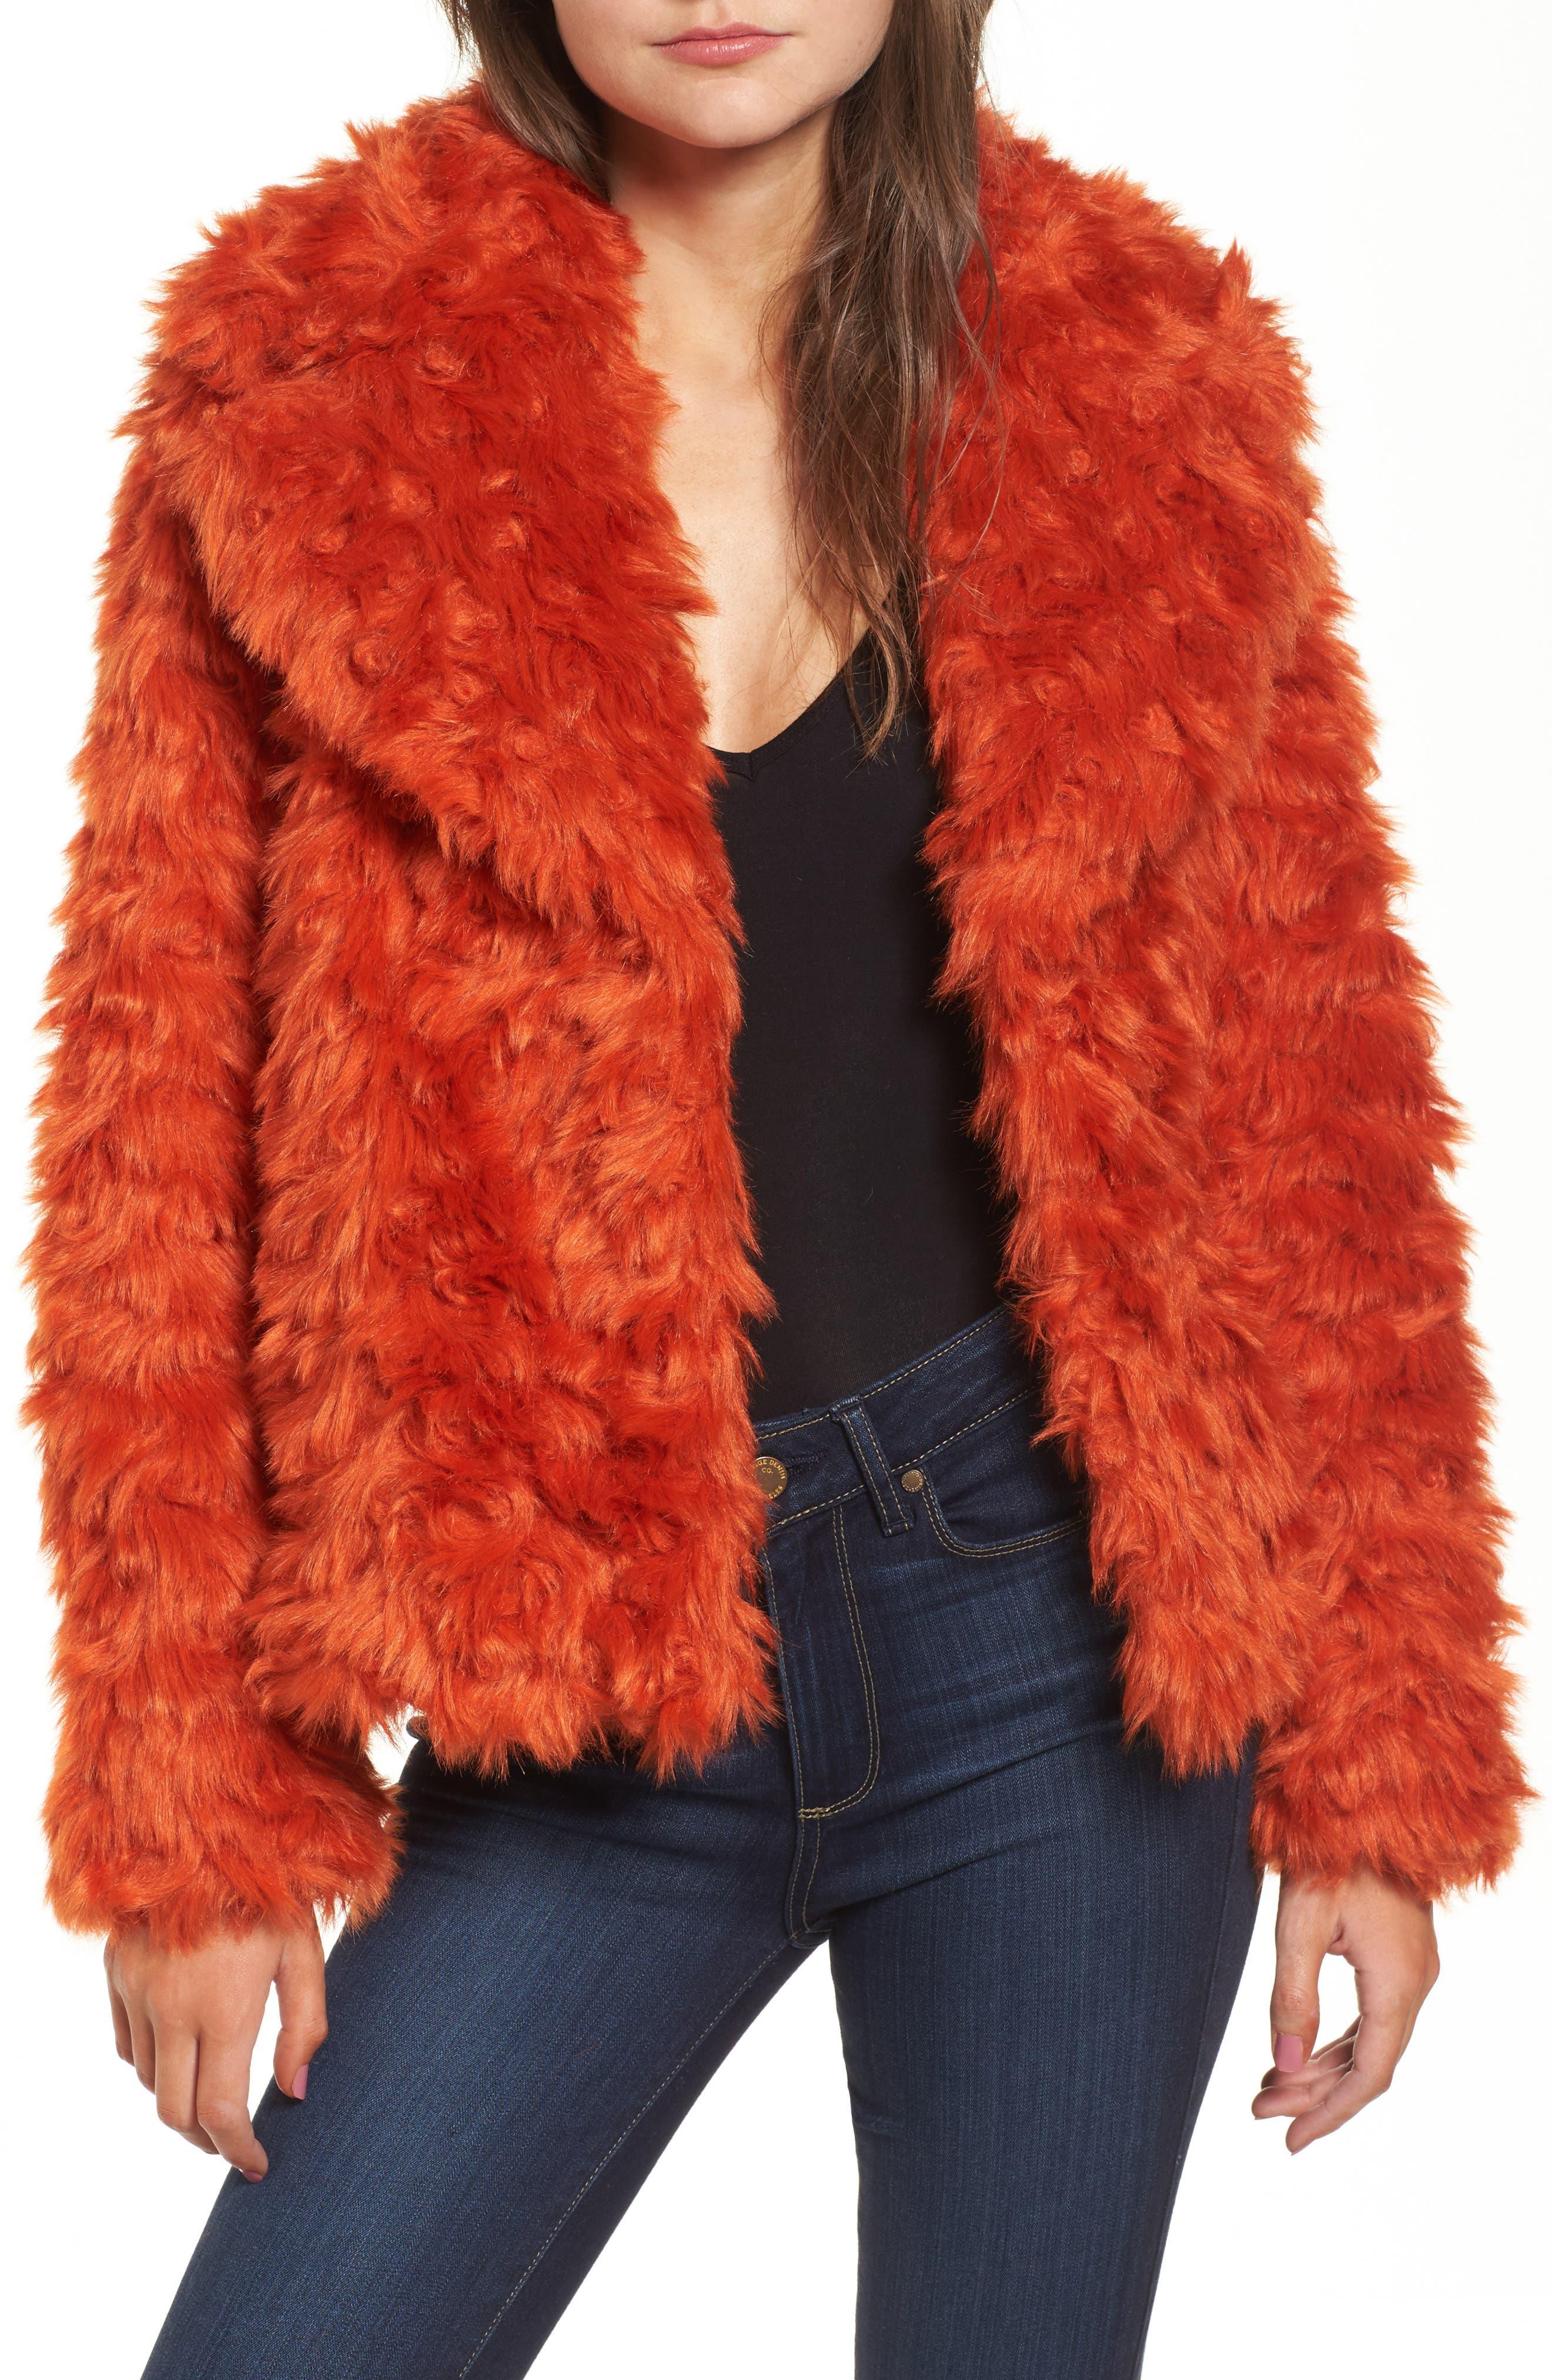 Curly Faux Fur Jacket,                             Main thumbnail 1, color,                             800